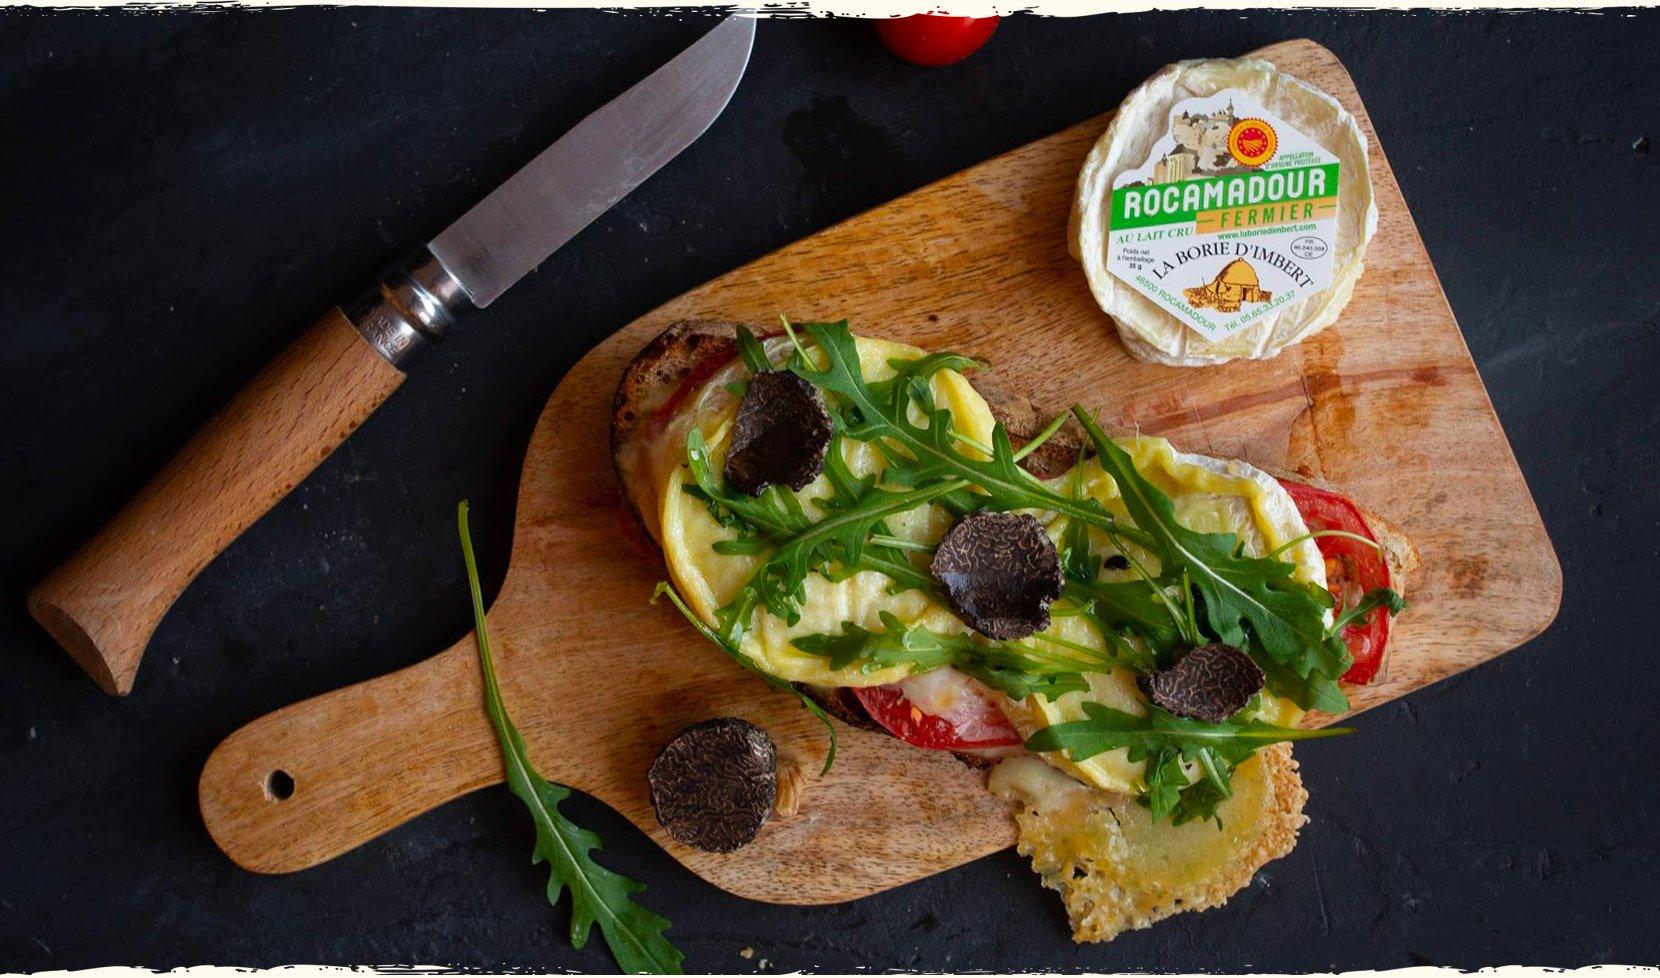 Tartine-rocamadour-tomate-miel-roquette-truffe-2